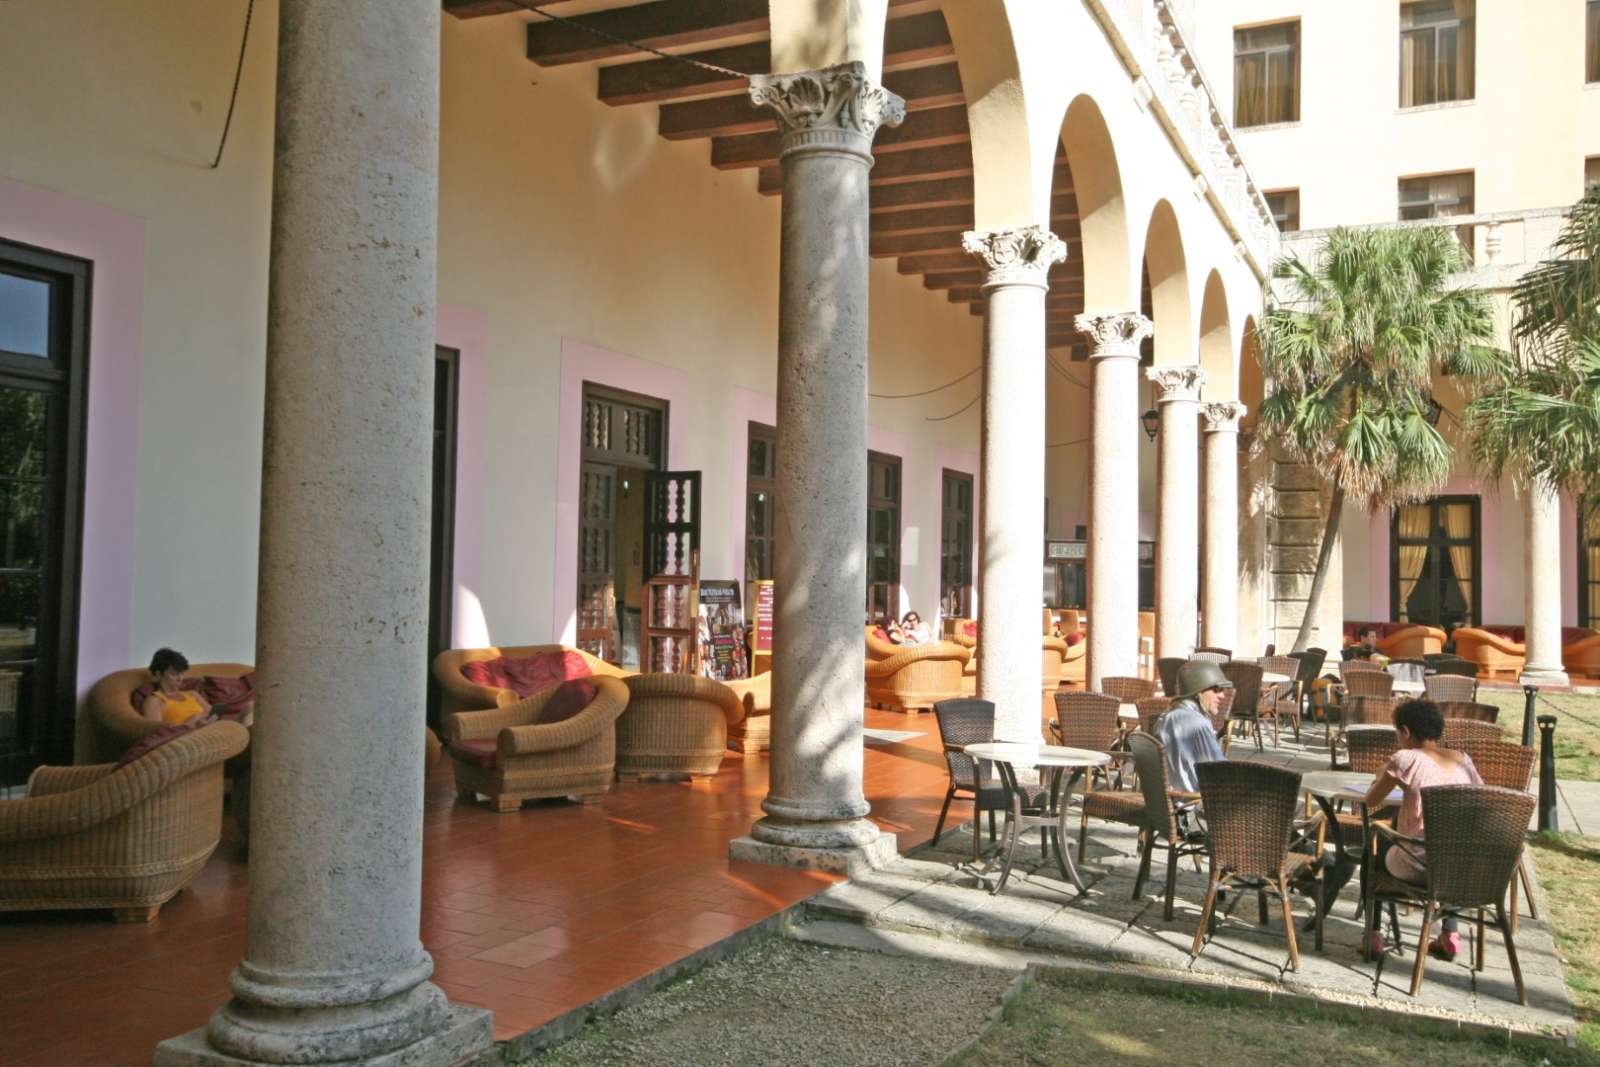 Terrace bar at the Hotel Nacional in Havana